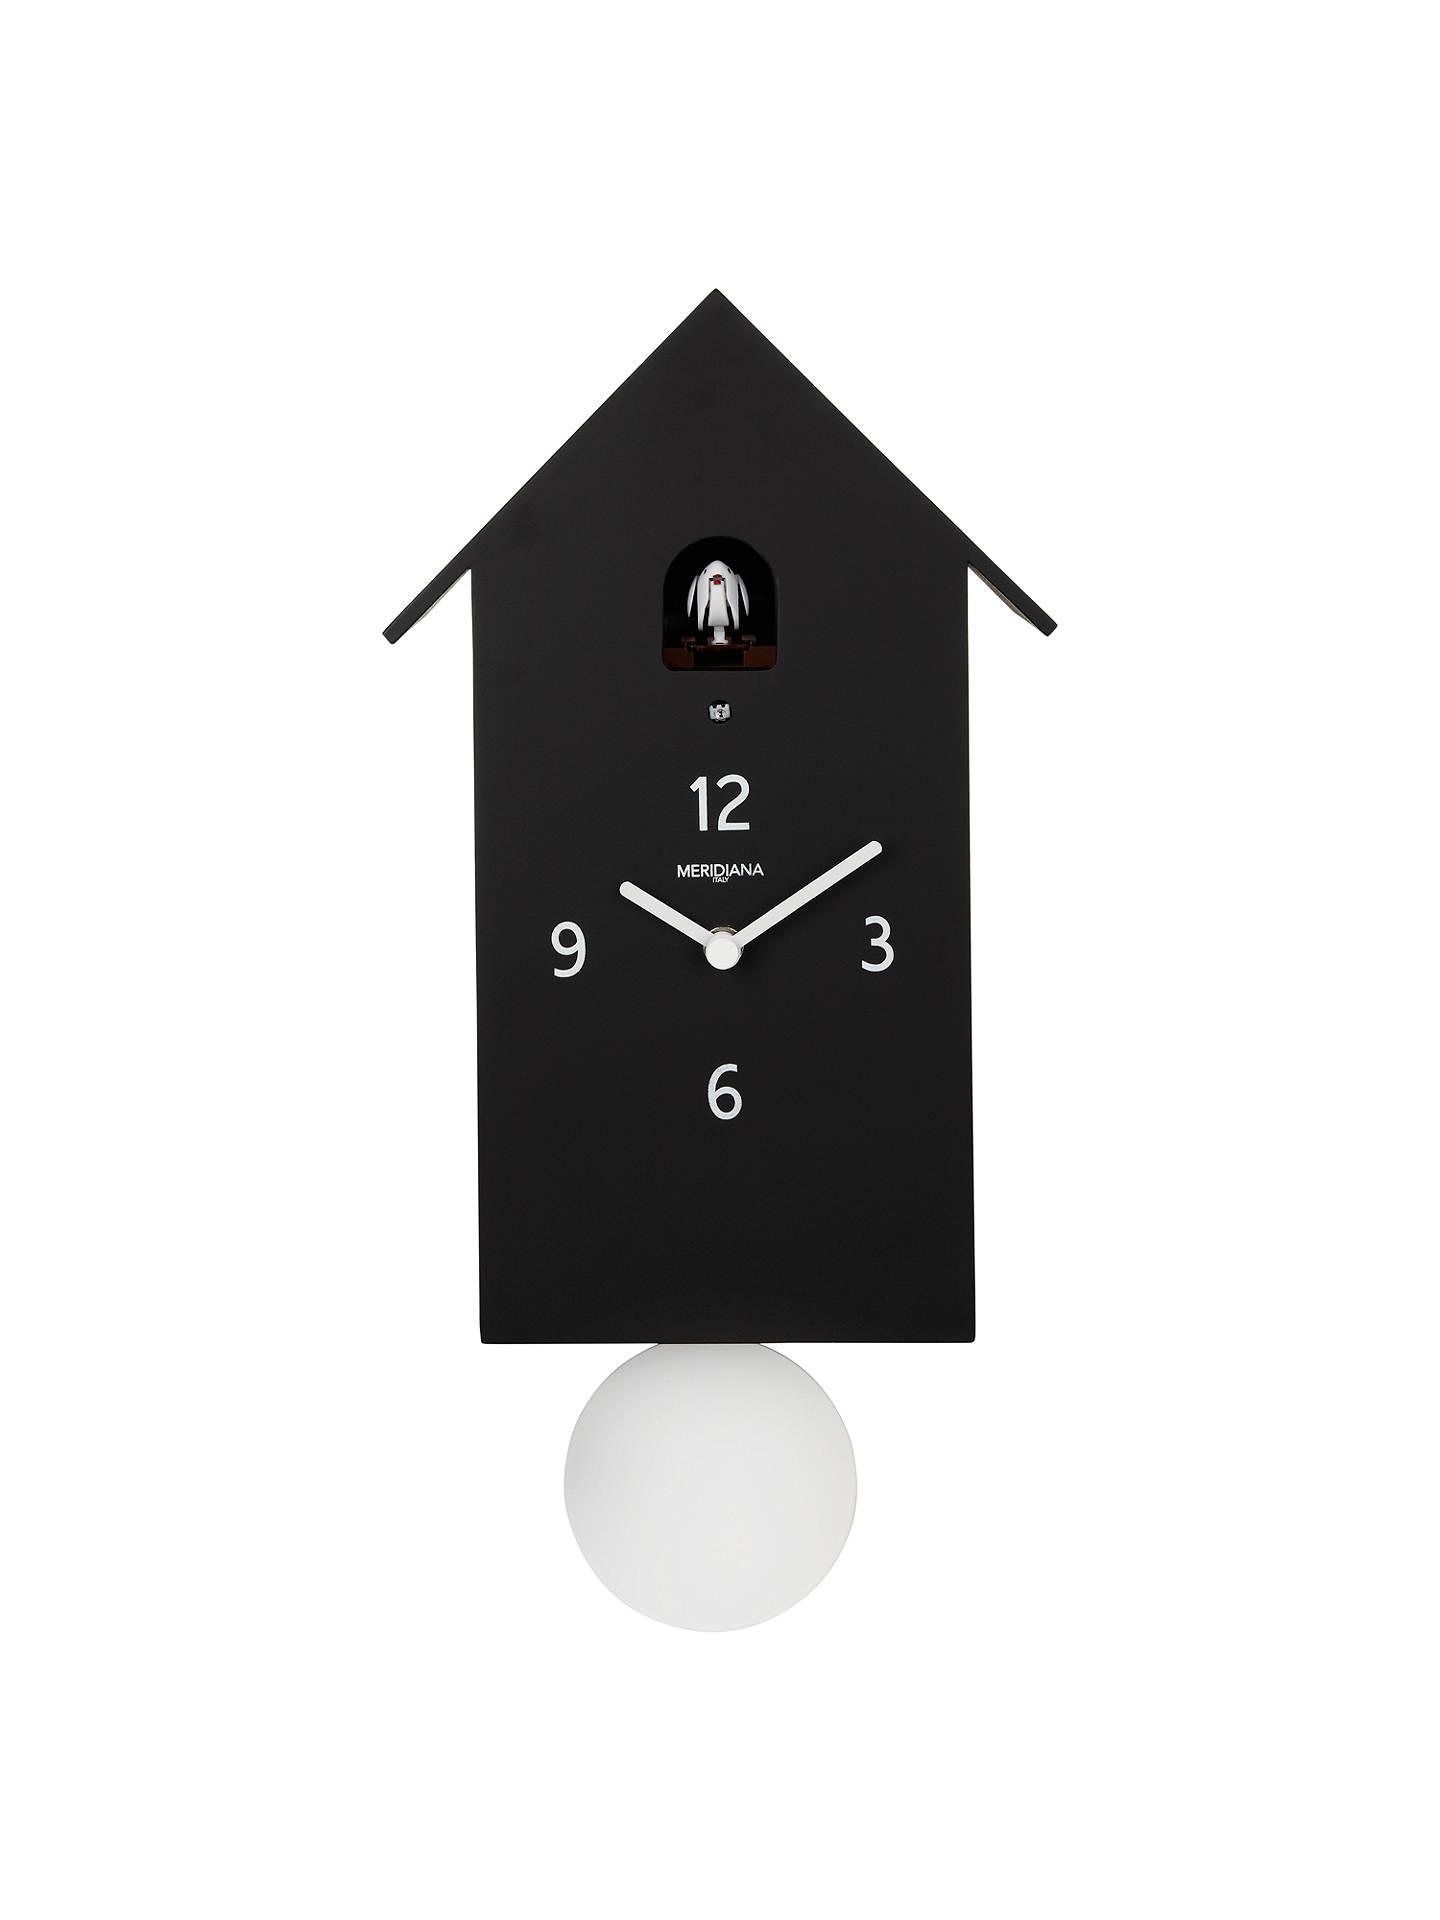 Diamantini Domeniconi Meridiana Cuckoo Clock H30 X W14 5 D10cm Black